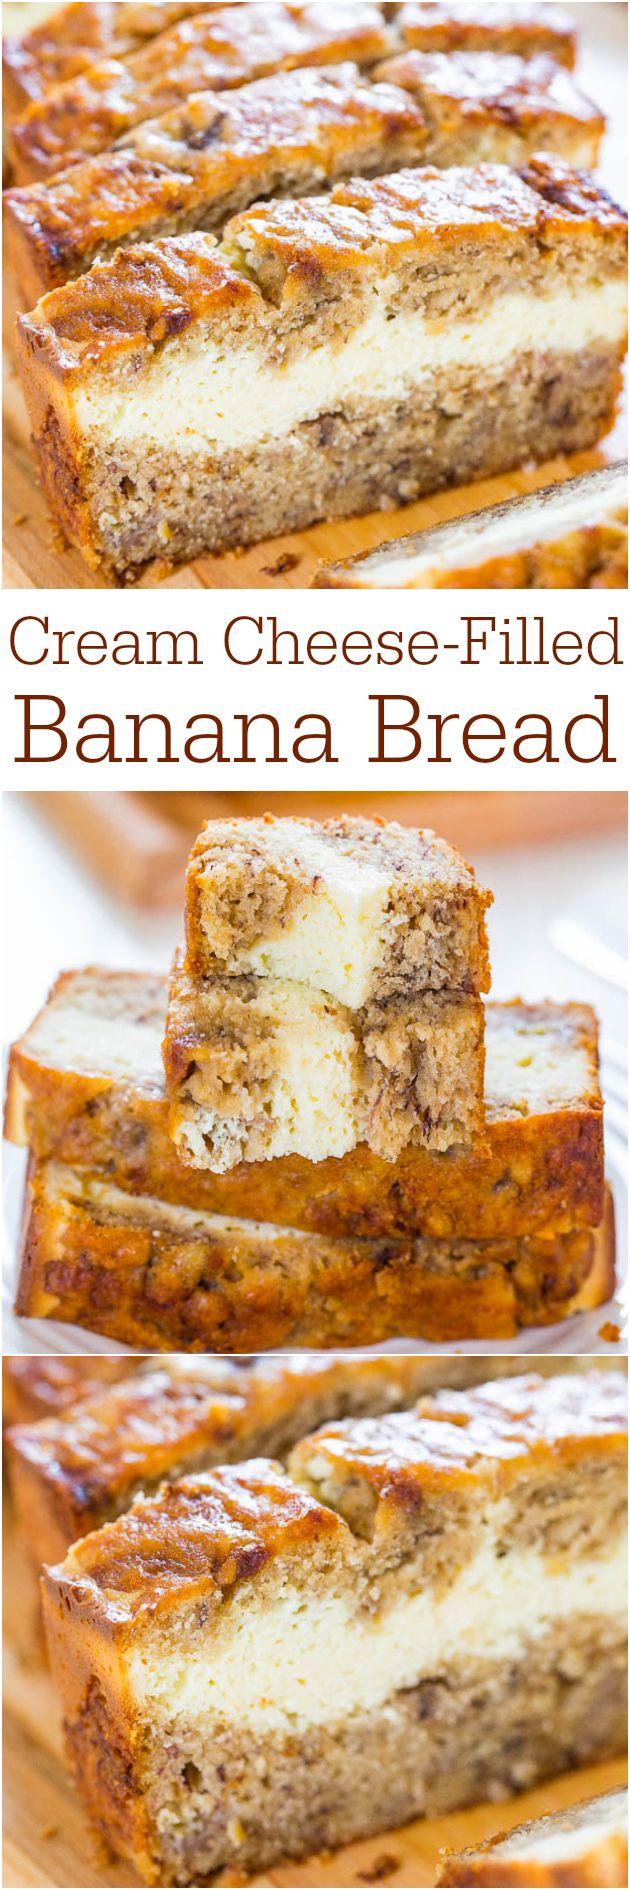 cream-cheese-banana-bread.jpg